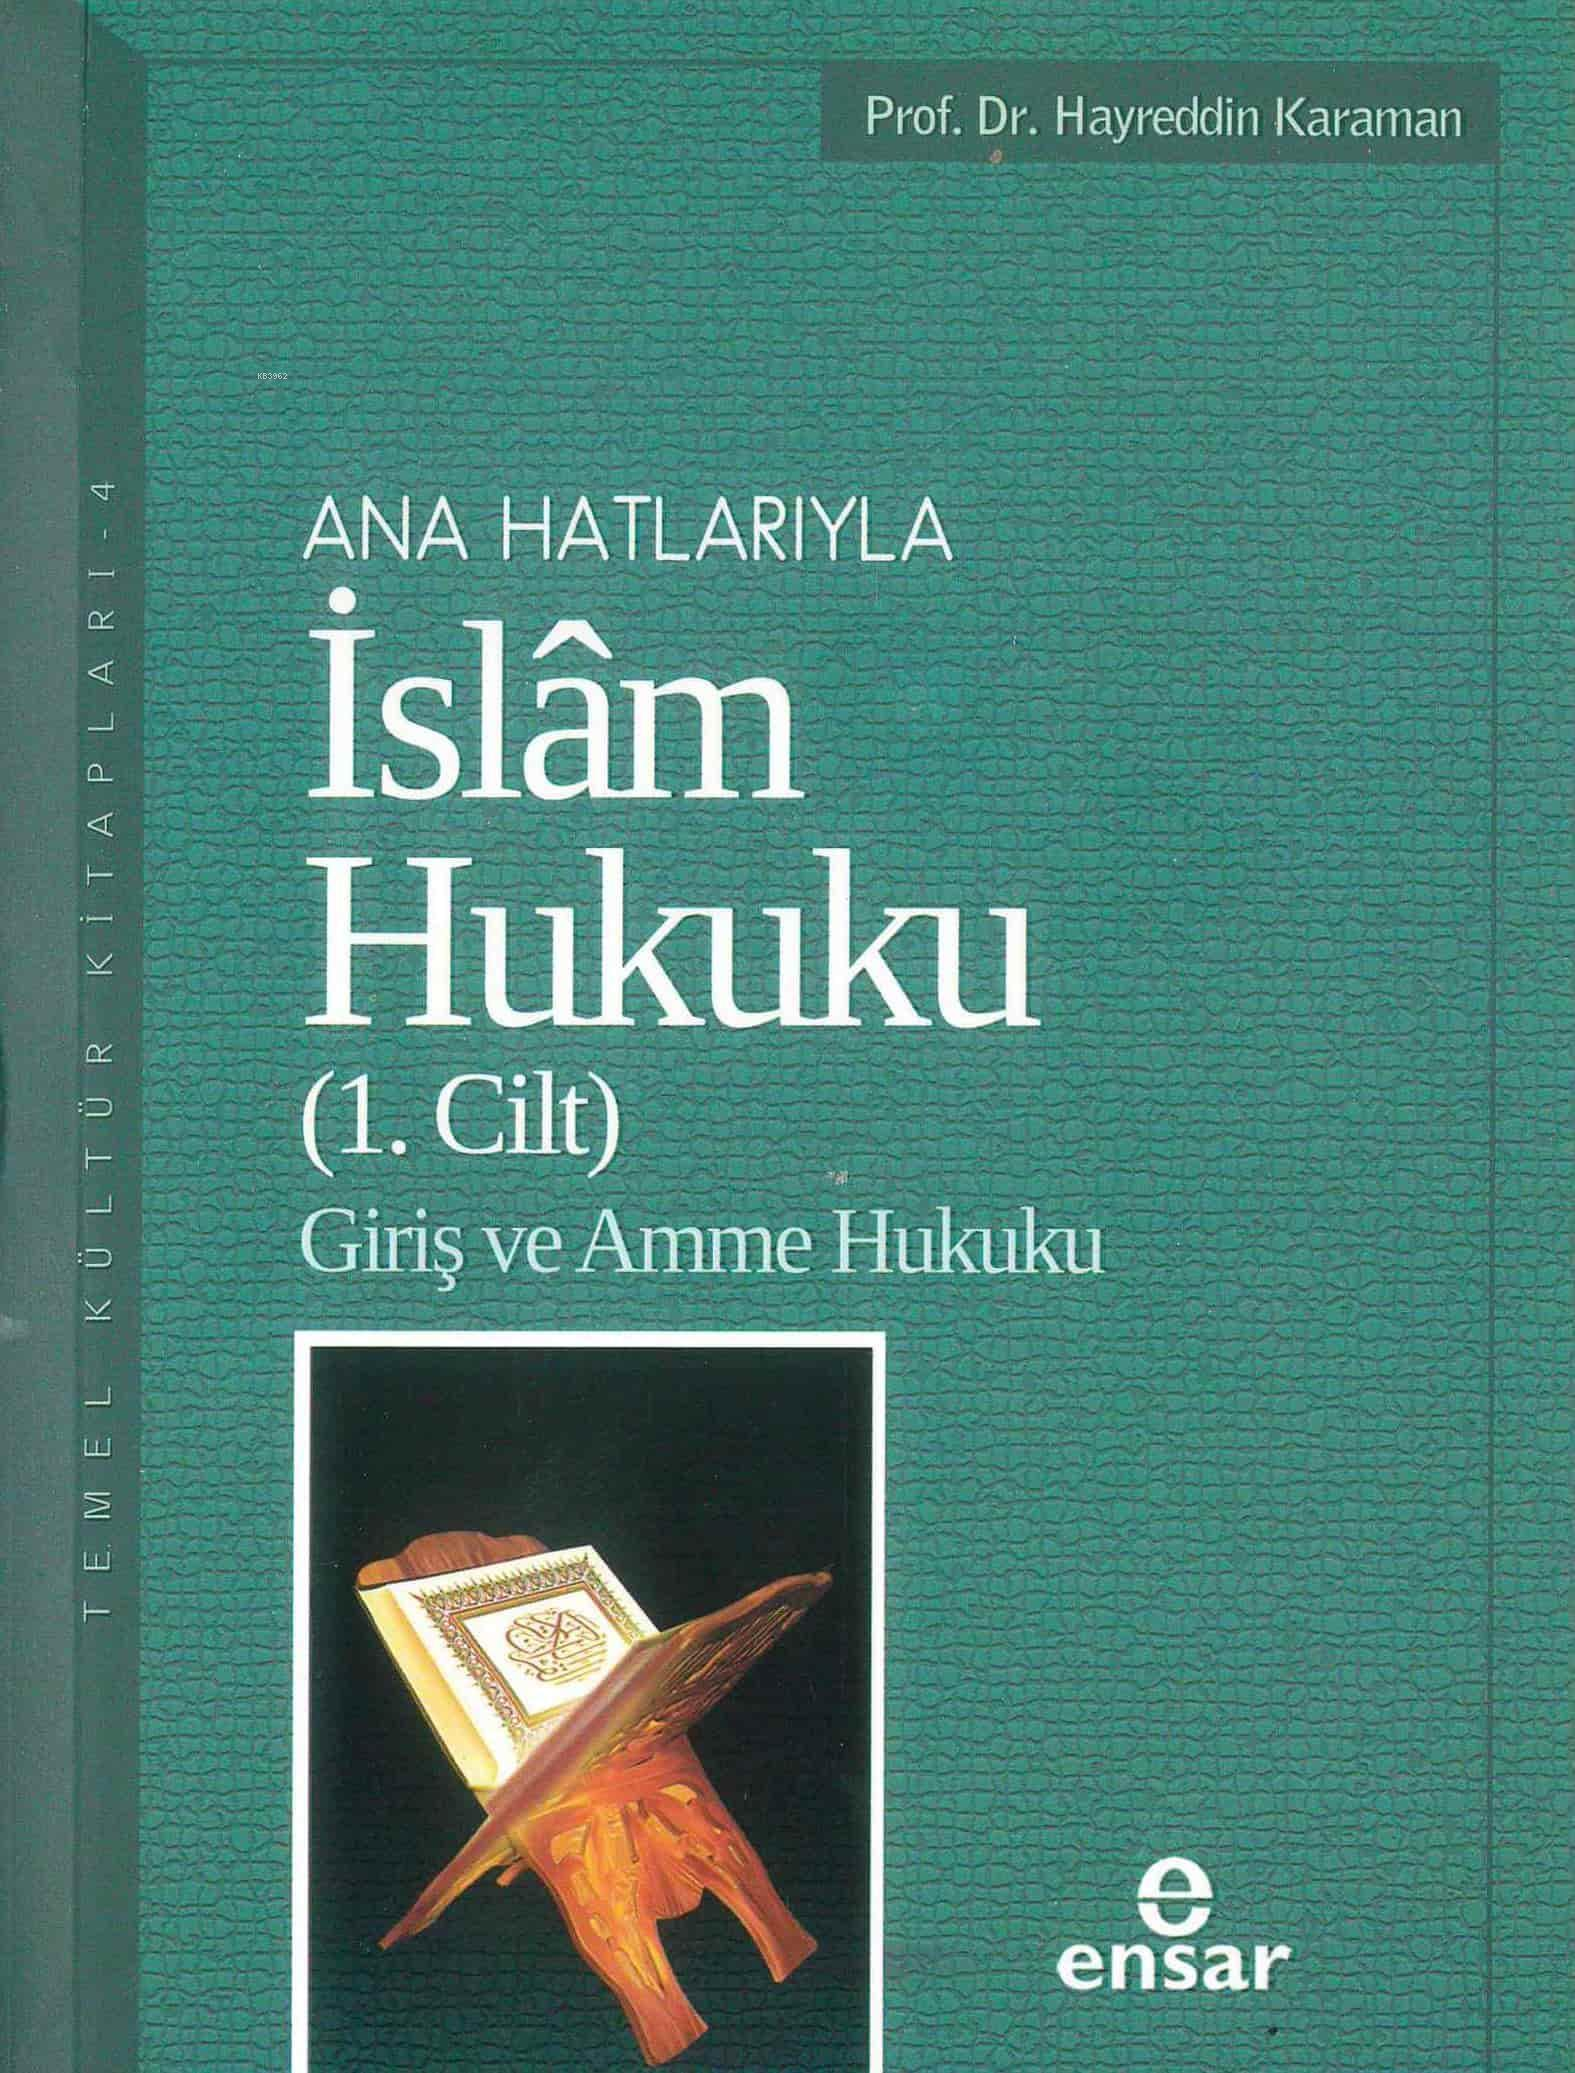 Anahatlarıyla İslam Hukuku Cilt 1